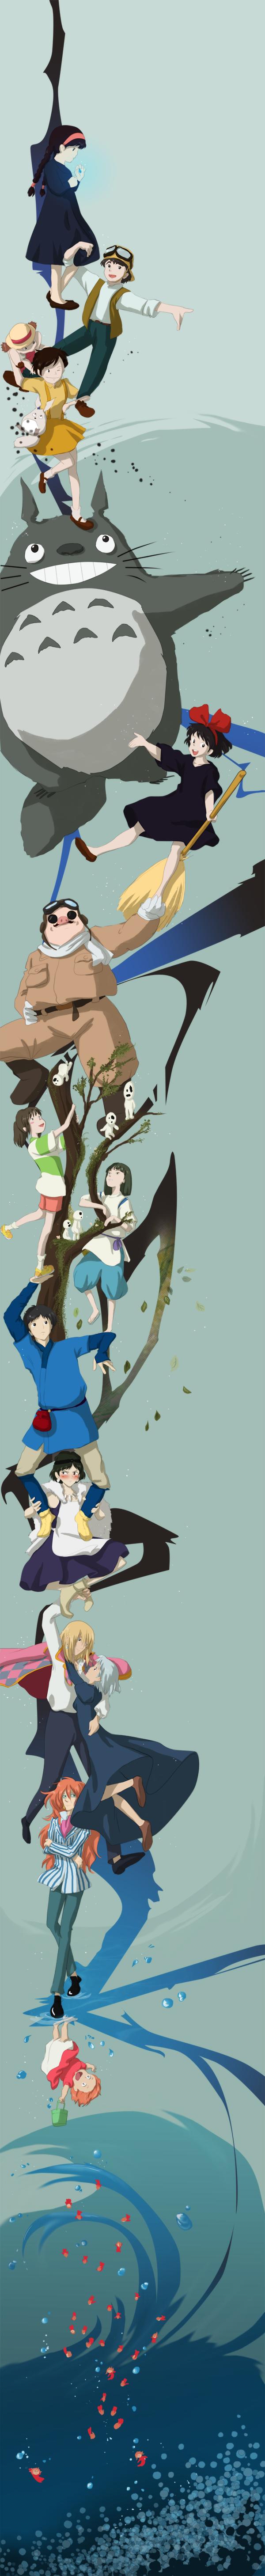 Laputa >> Totoro >> Kiki >> Porco rosso >>Spirited away >>Mononoke Hime >> Howl's moving castle >> Ponyo << Ghibli <3